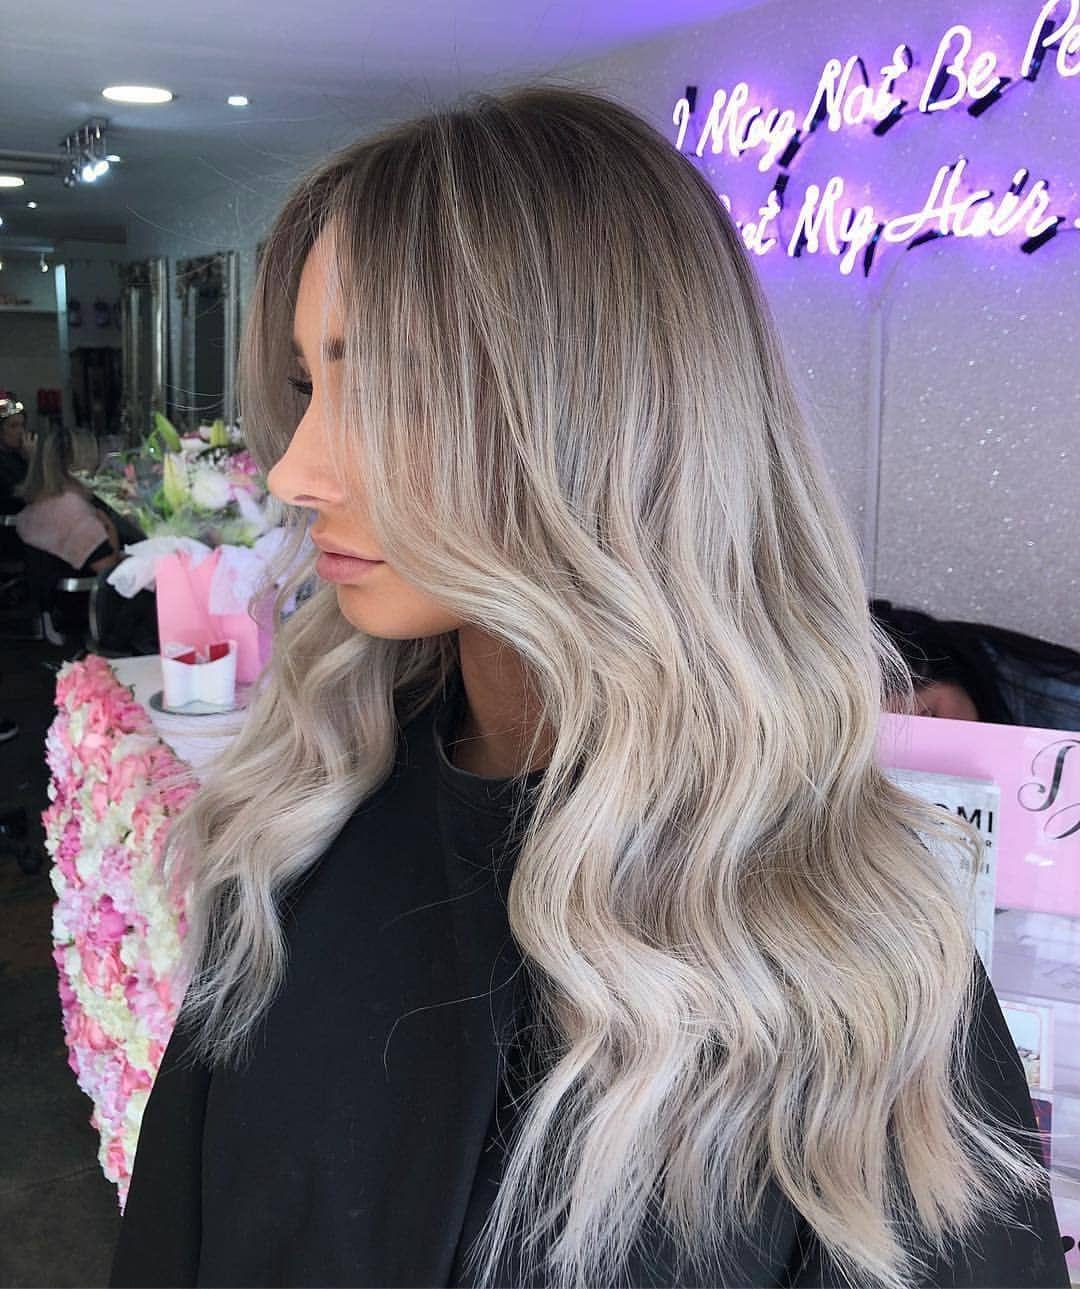 Scandinavian Blonde Beauty Works Hair Extensions Beauty Worksonline Instagram Photos And Videos Beauty Works Hair Extensions Beauty Works Beauty